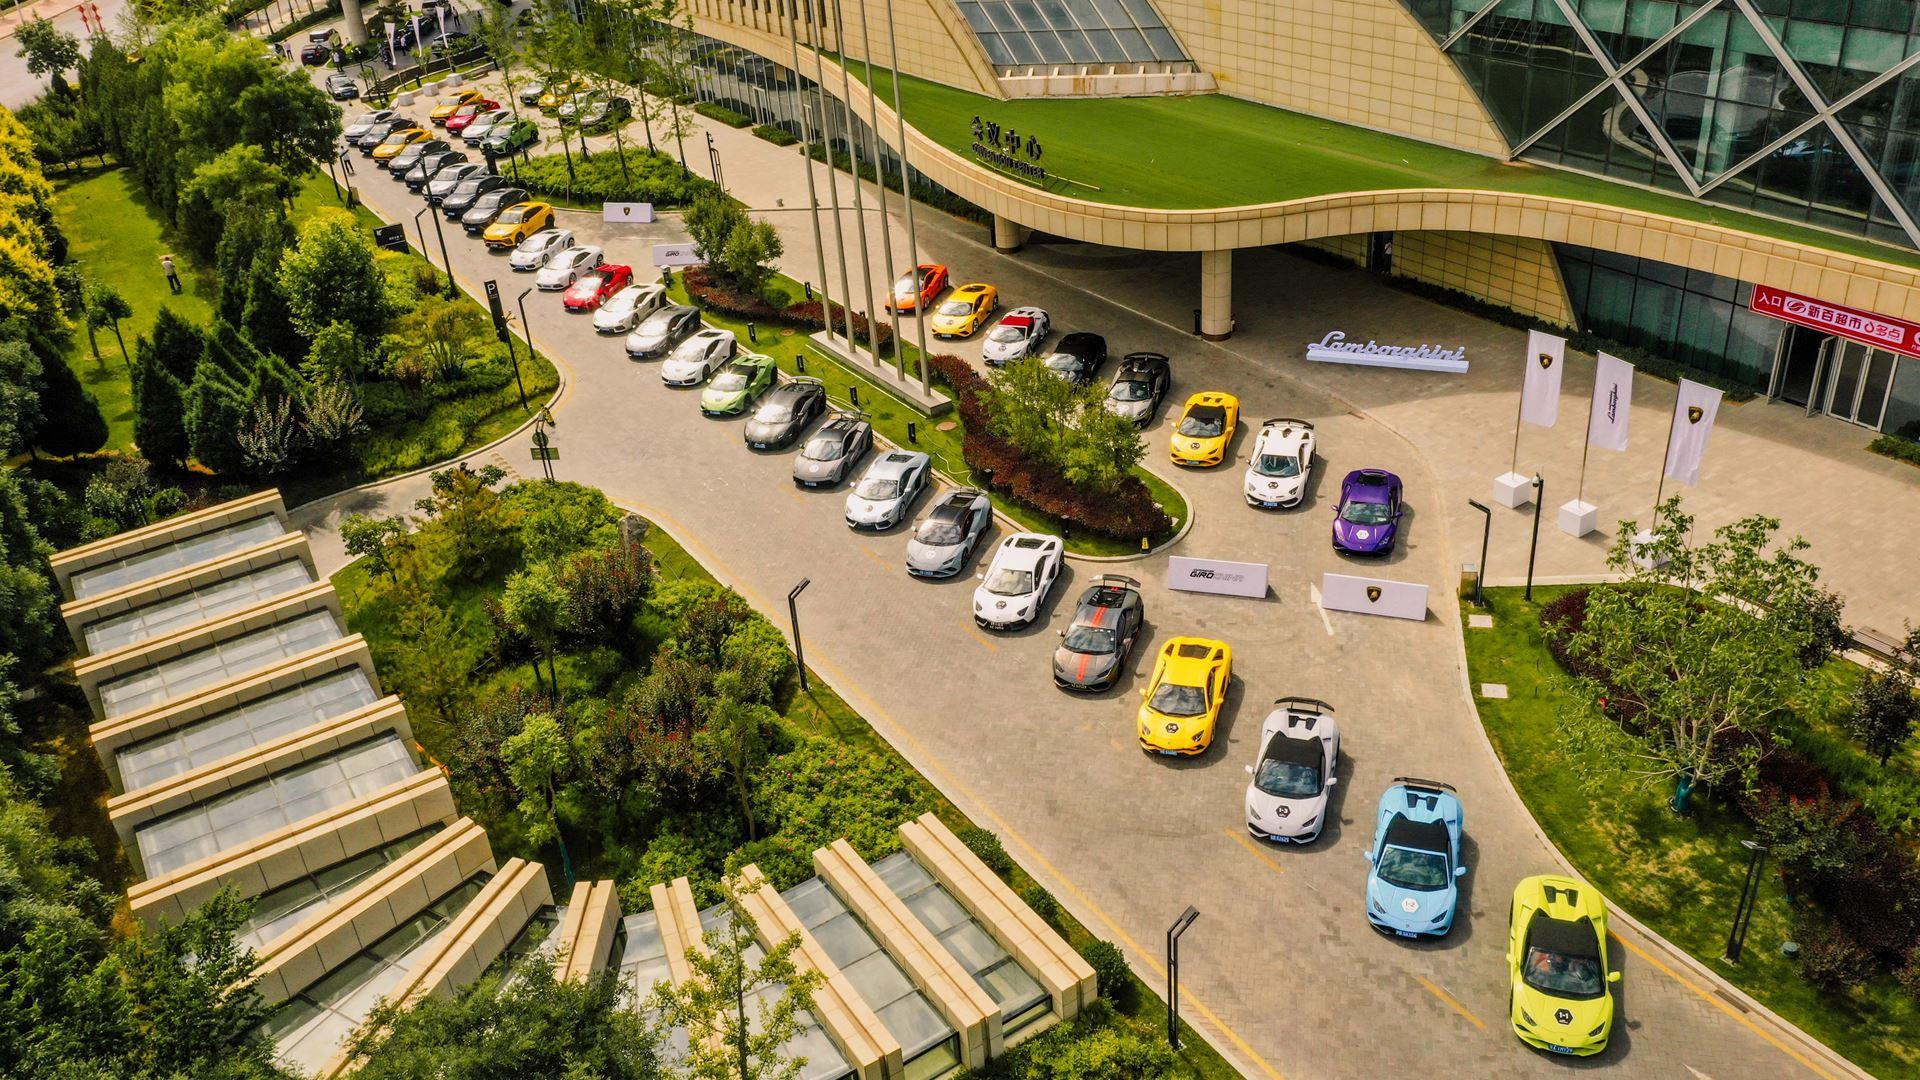 "Lamborghini Esperienza Giro ""Journey into the Vast"" Unparalleled expedition of 42 Lamborghinis through the North West of China - Image 4"